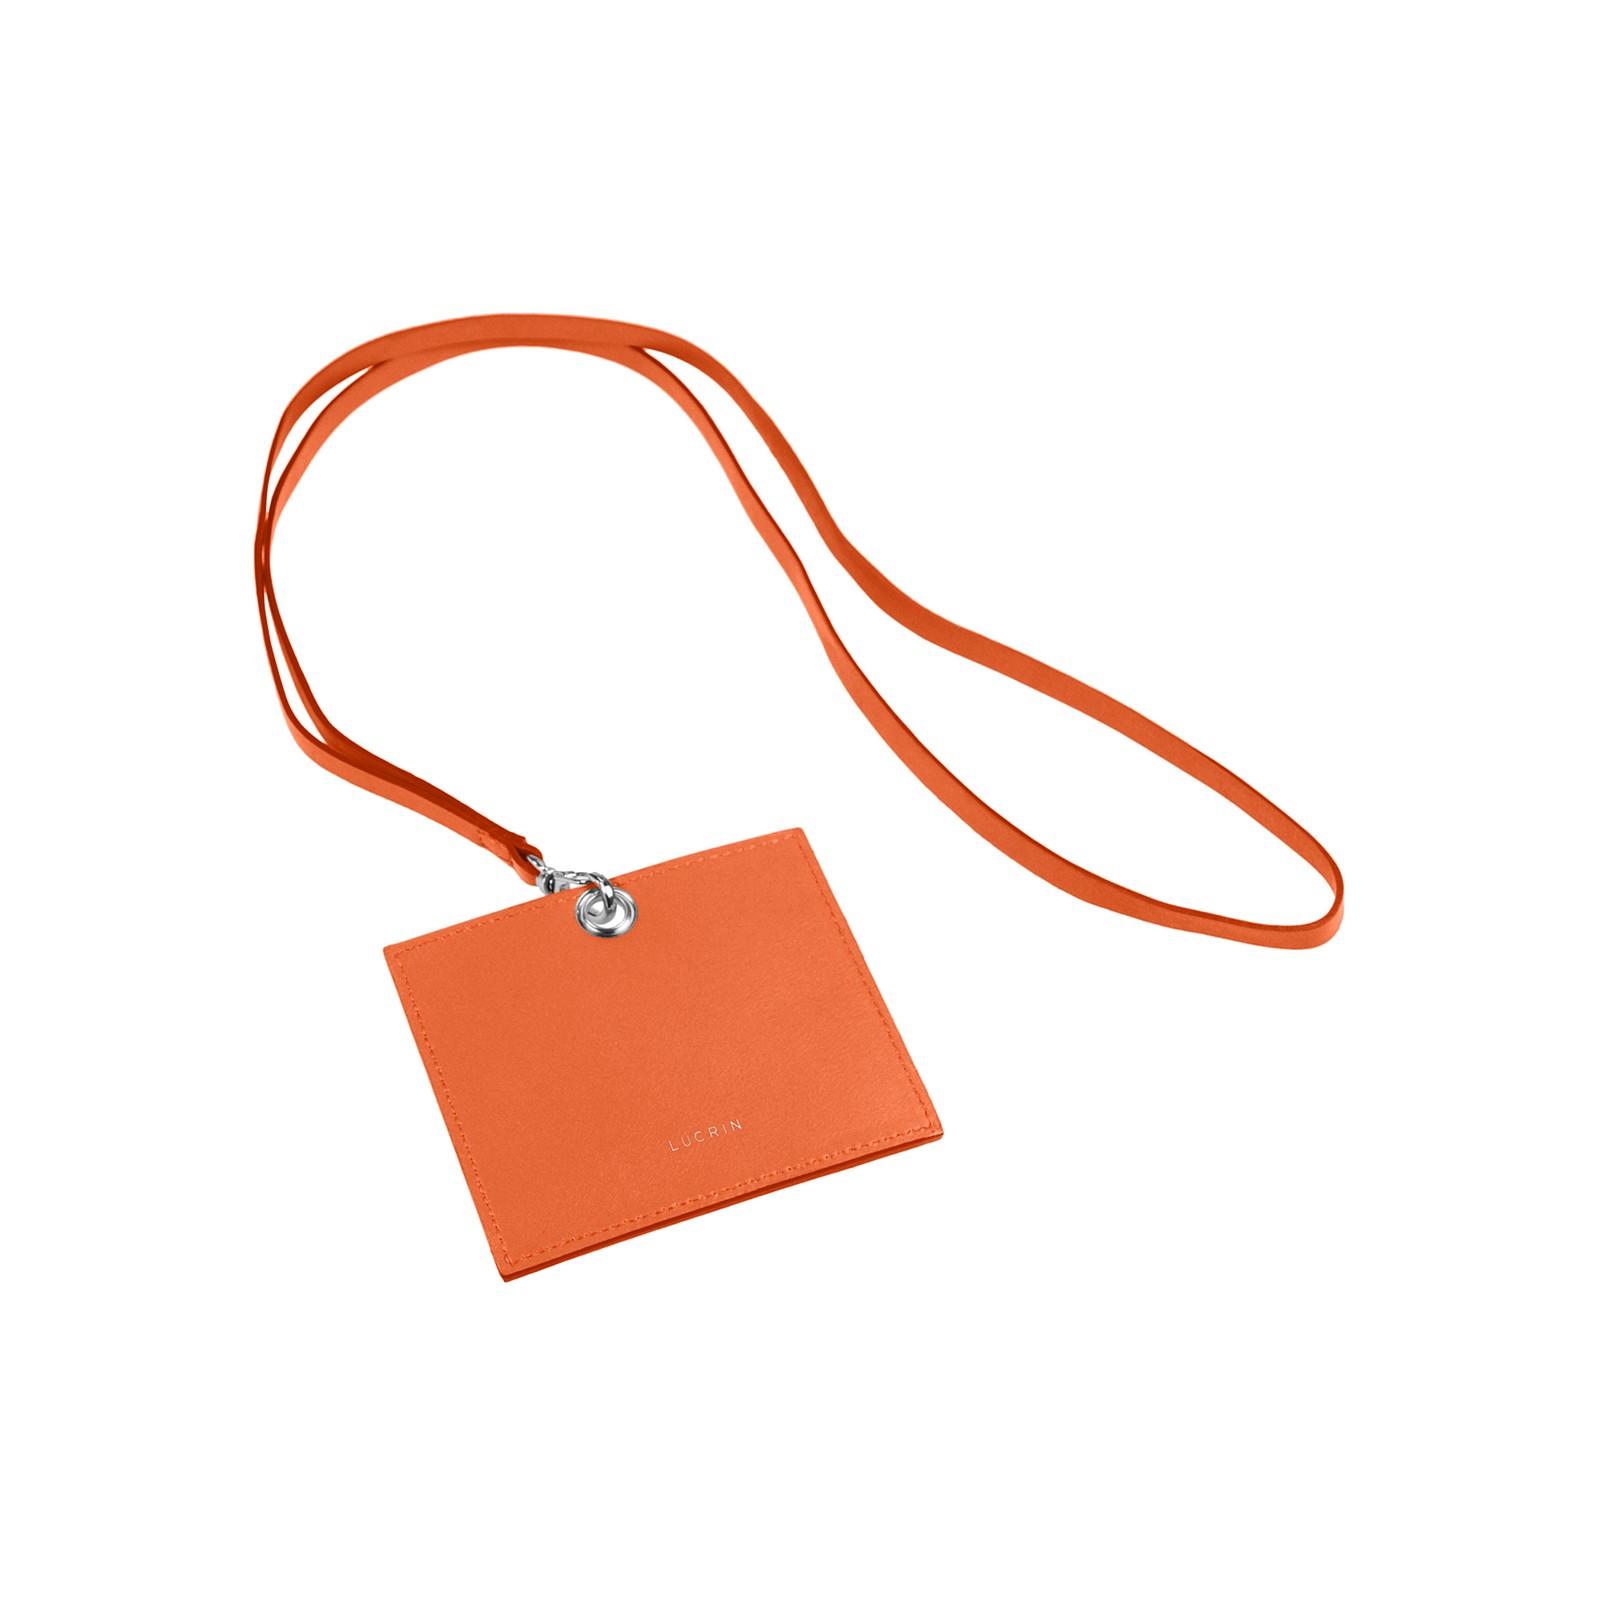 Portebadge En Cuir - Porte badge cuir